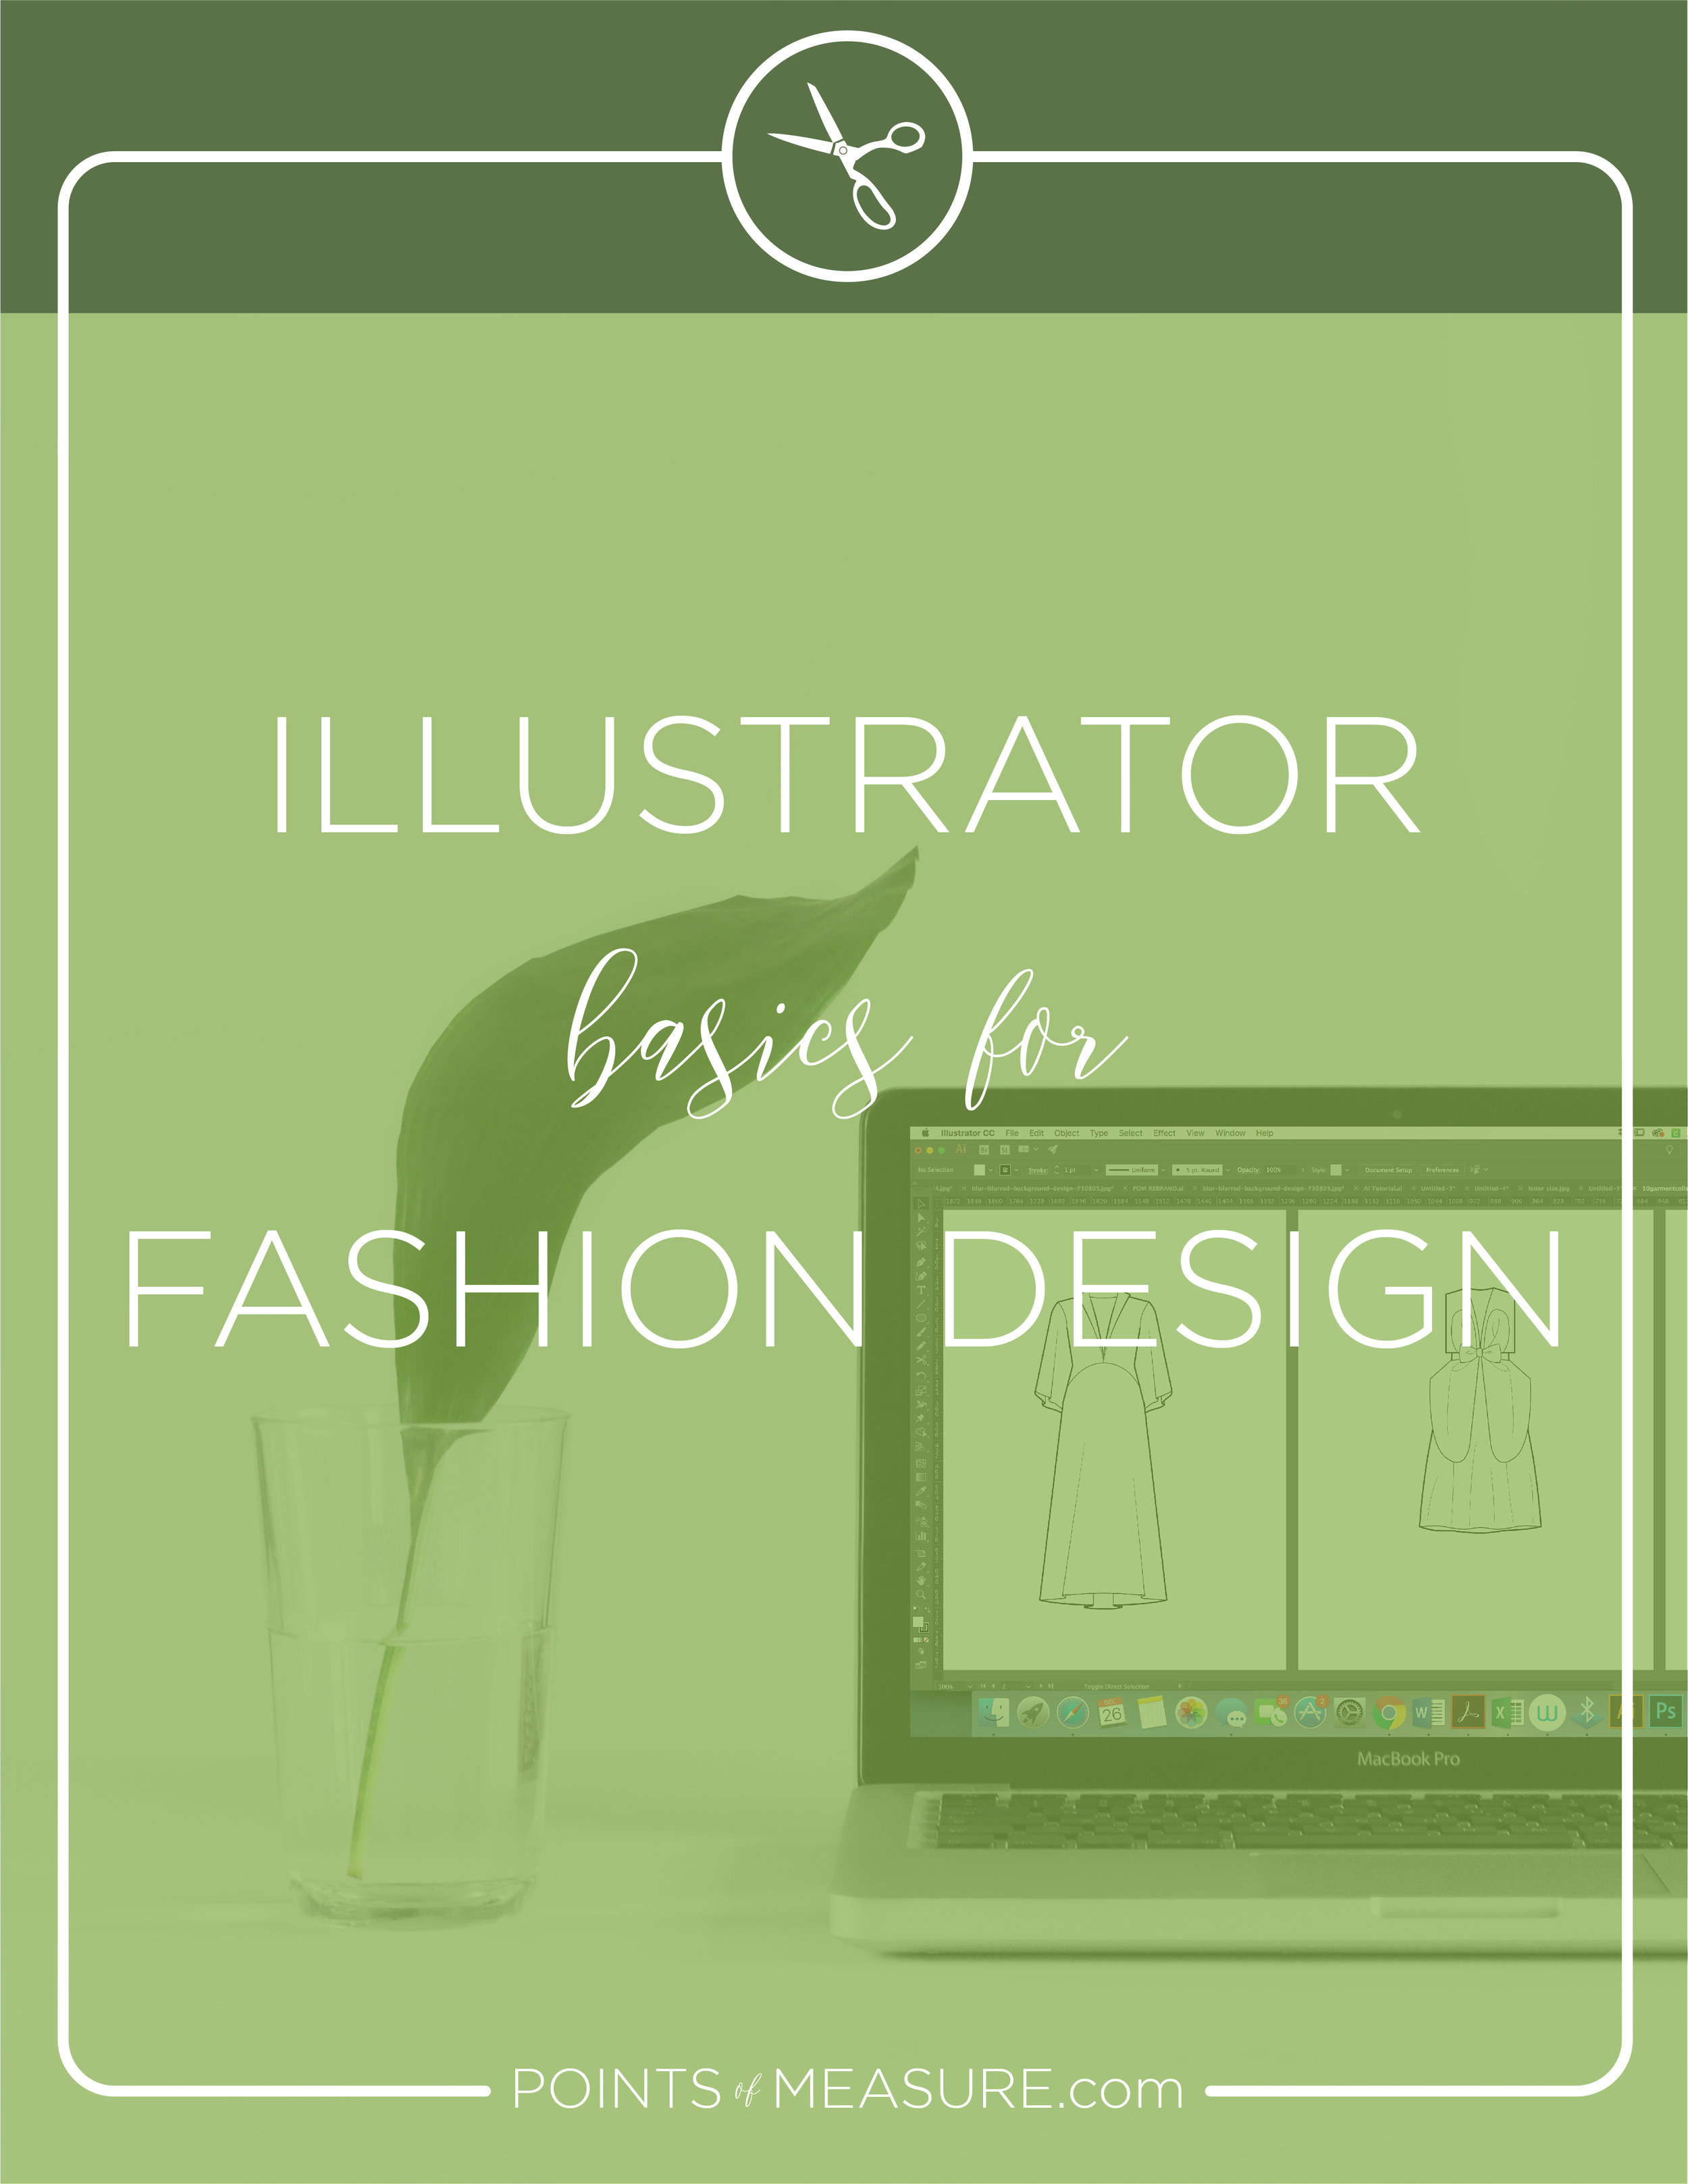 illustrator basics.jpg